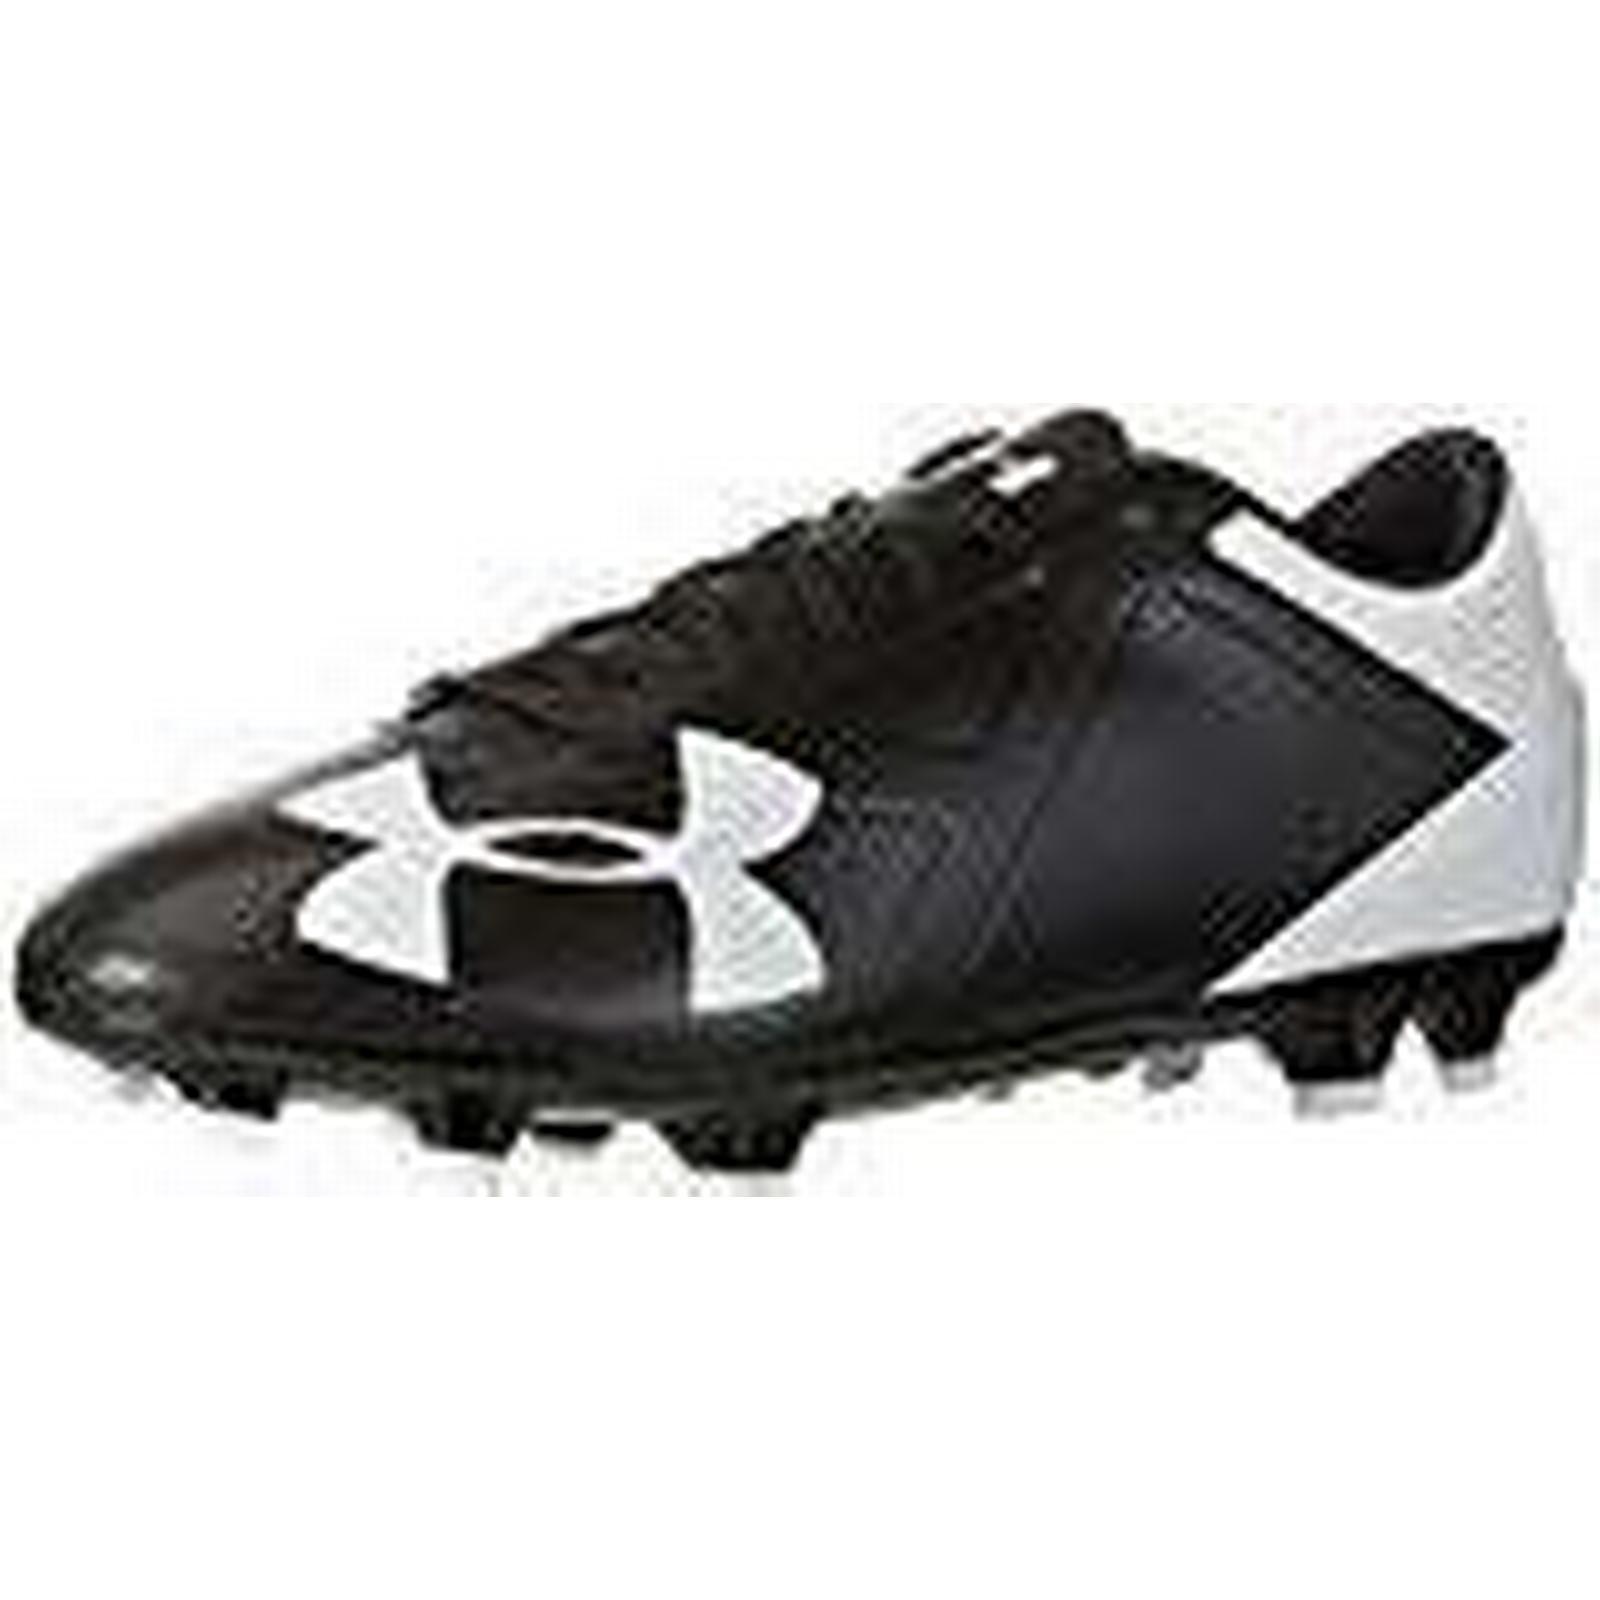 Under Armour Men's UA Spotlight DL FG Football UK Boots, (Black 003), 9.5 UK Football 44/45 EU 56e1a6